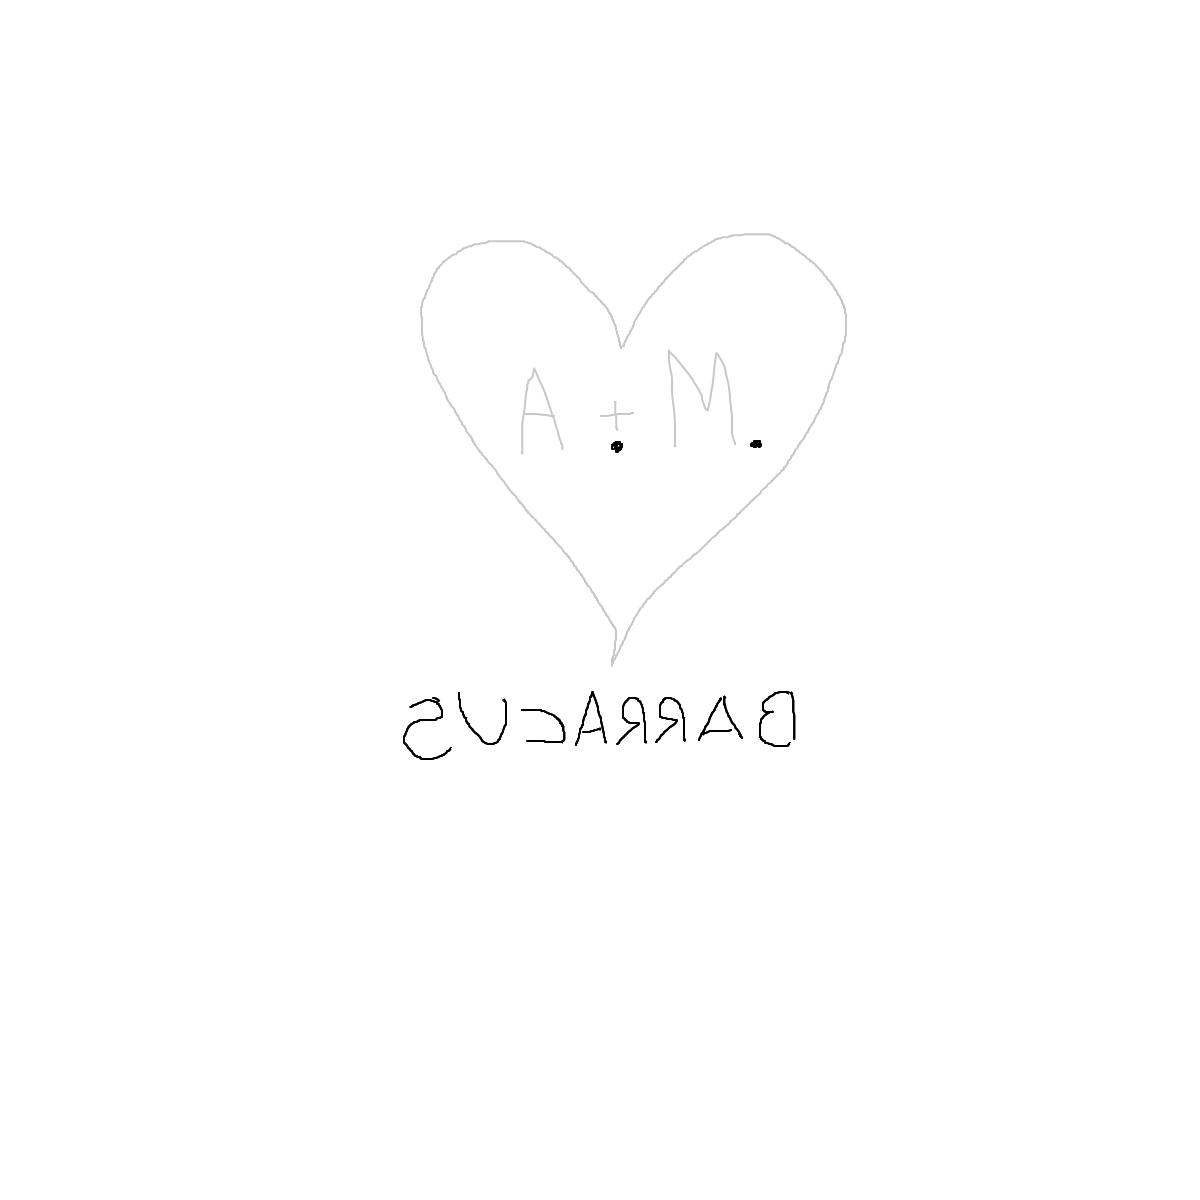 BAAAM drawing#2963 lat:50.0583114624023440lng: 15.1926097869873050